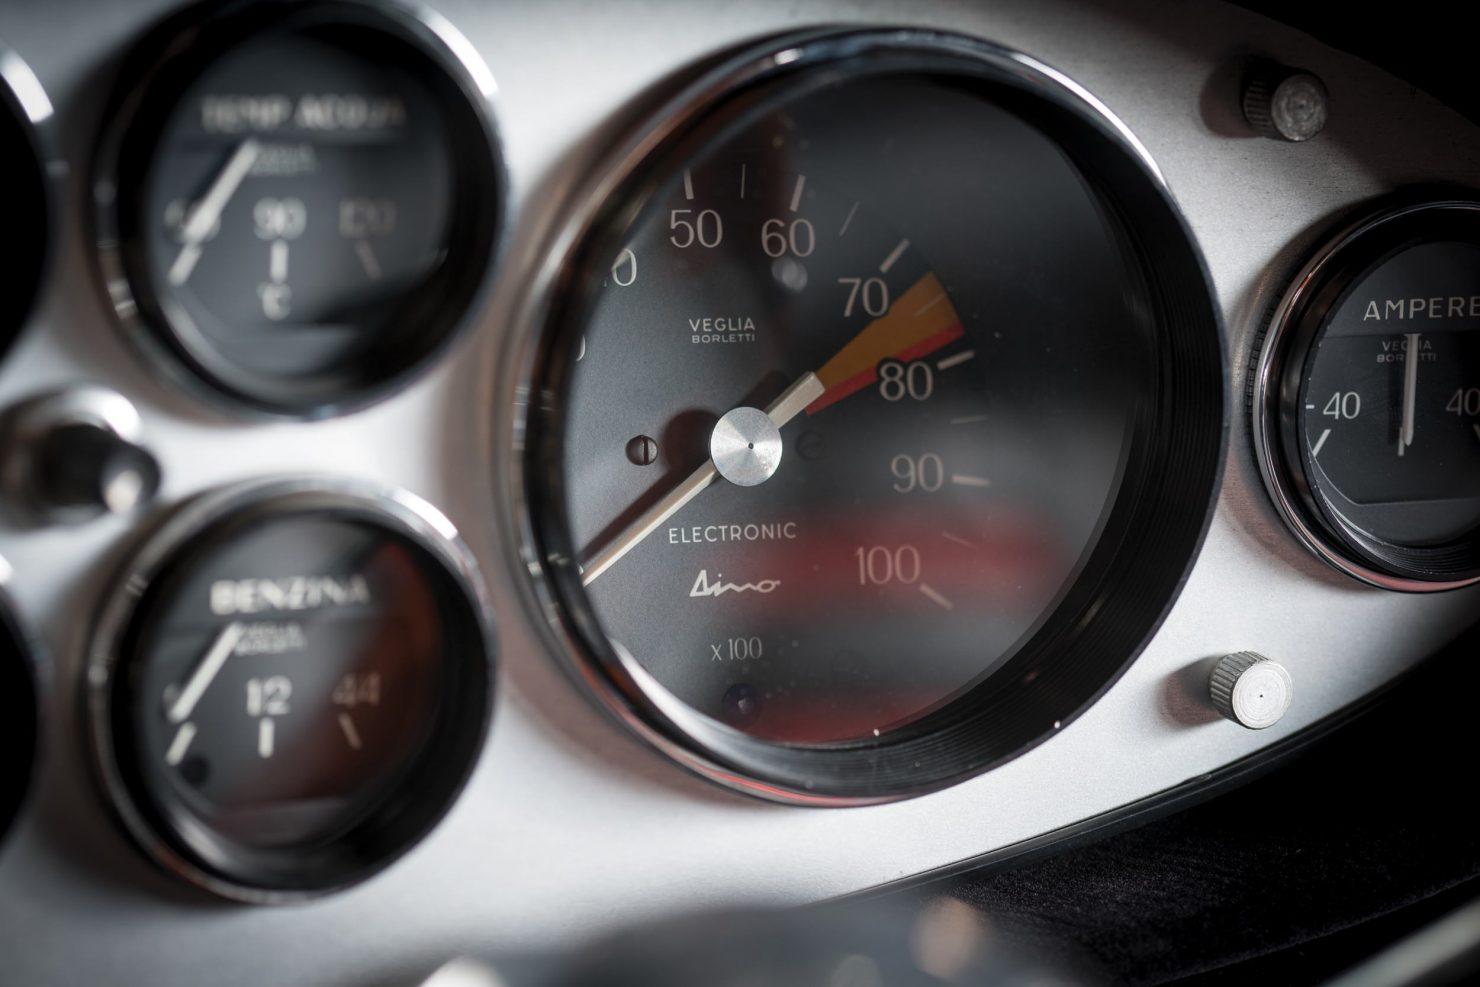 ferrari dino 246 13 1480x987 - 1969 Ferrari Dino 246 GT